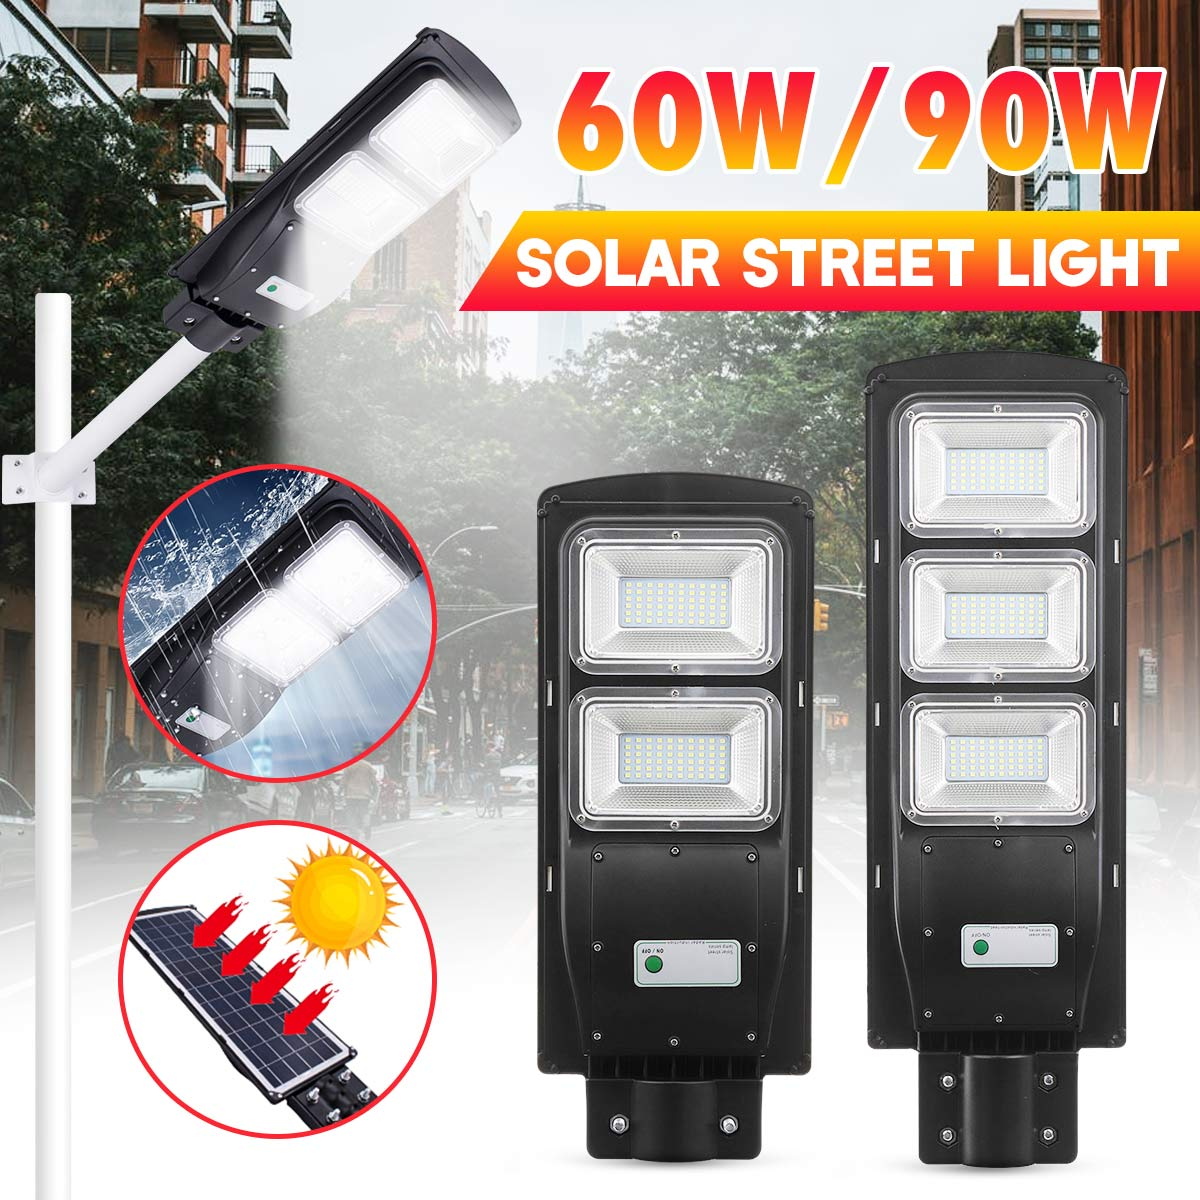 60W 90W 120/180LED Solar Street Light Rada R+PIR Motion Sensor Outdoor Wall Lamp Solar Waterproof Landscape Garden Light